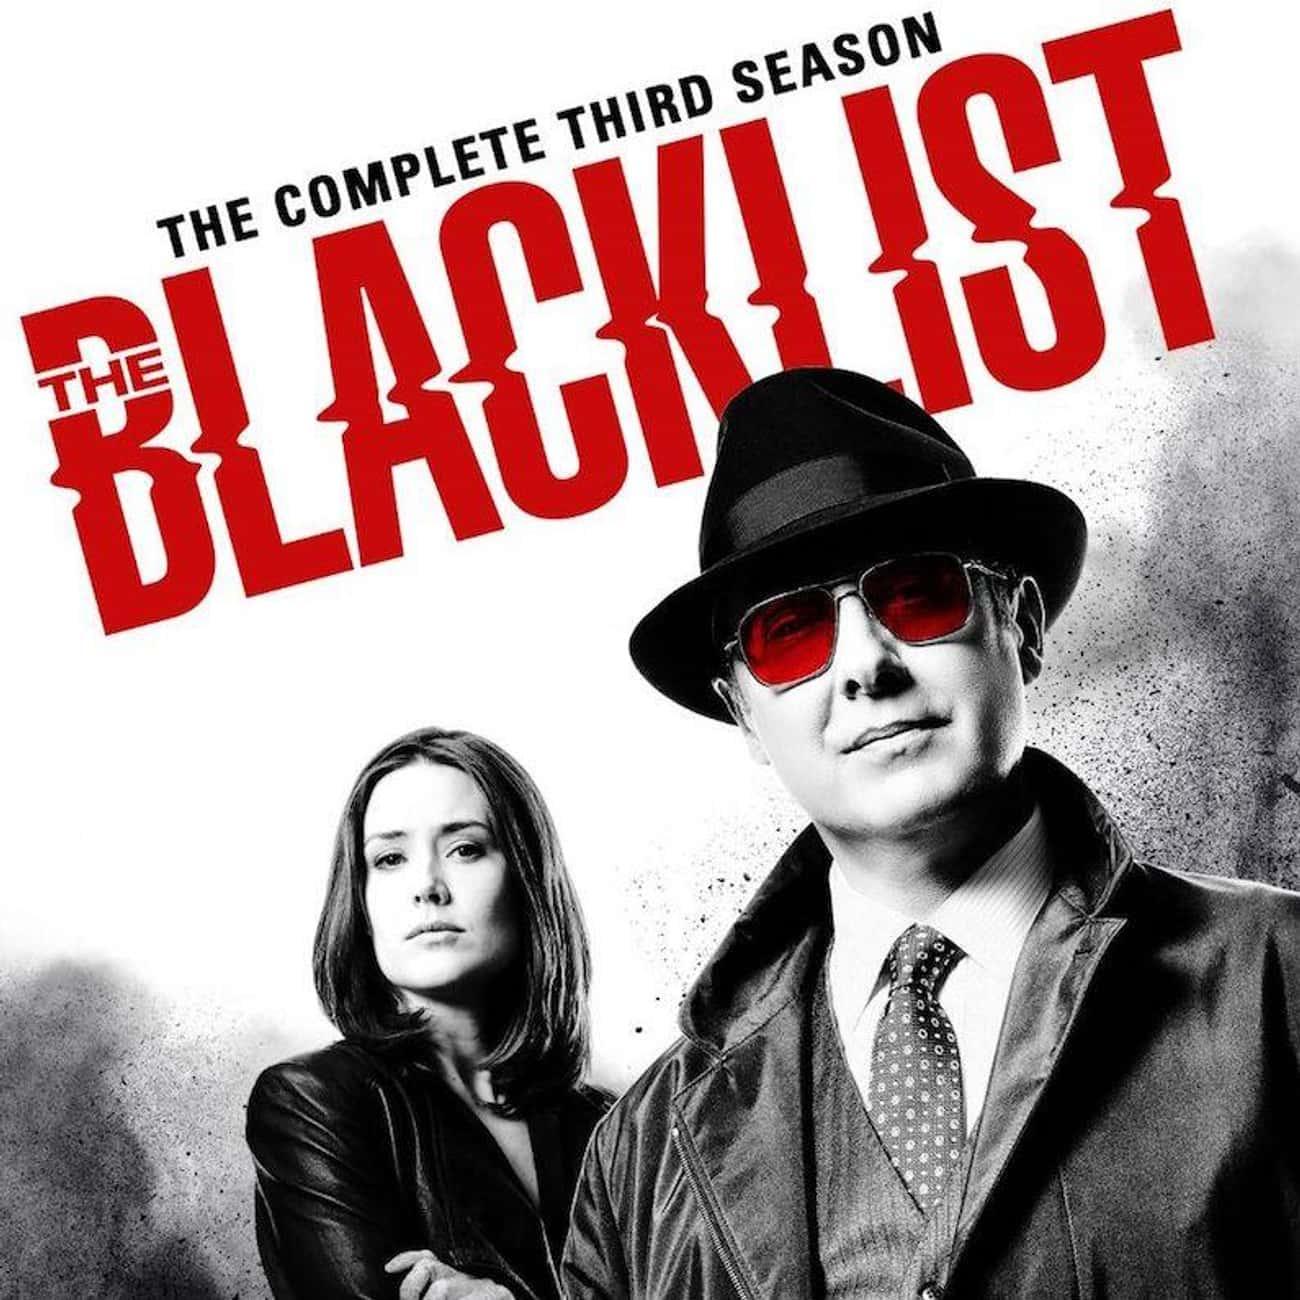 The Blacklist - Season 3